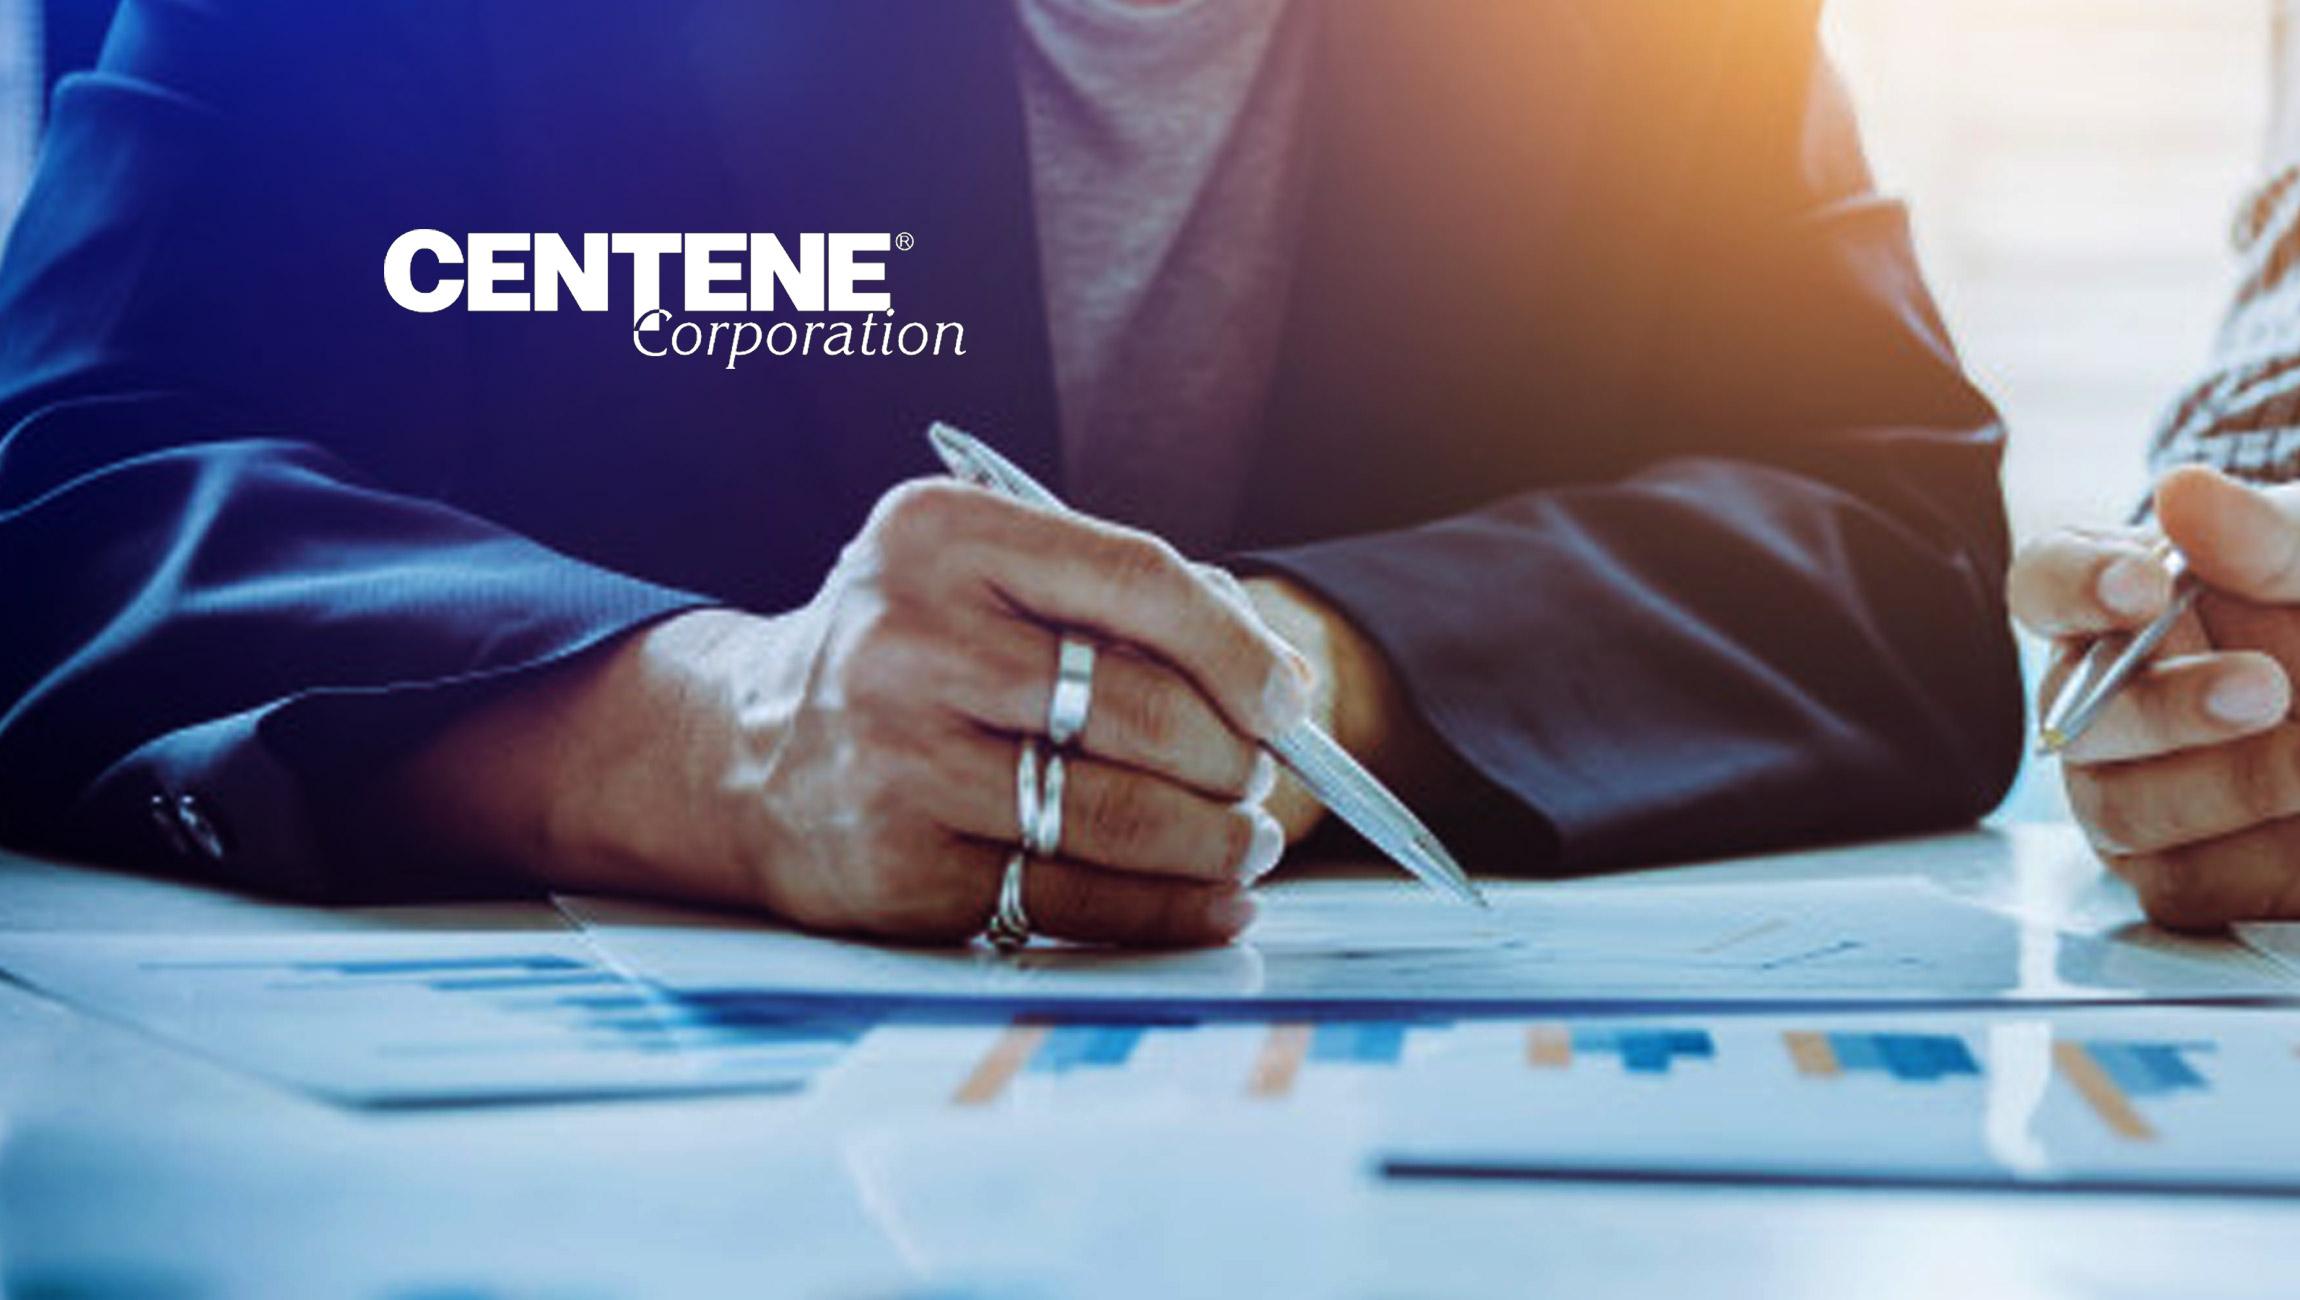 Centene Corporation Announces 2020 Guidance